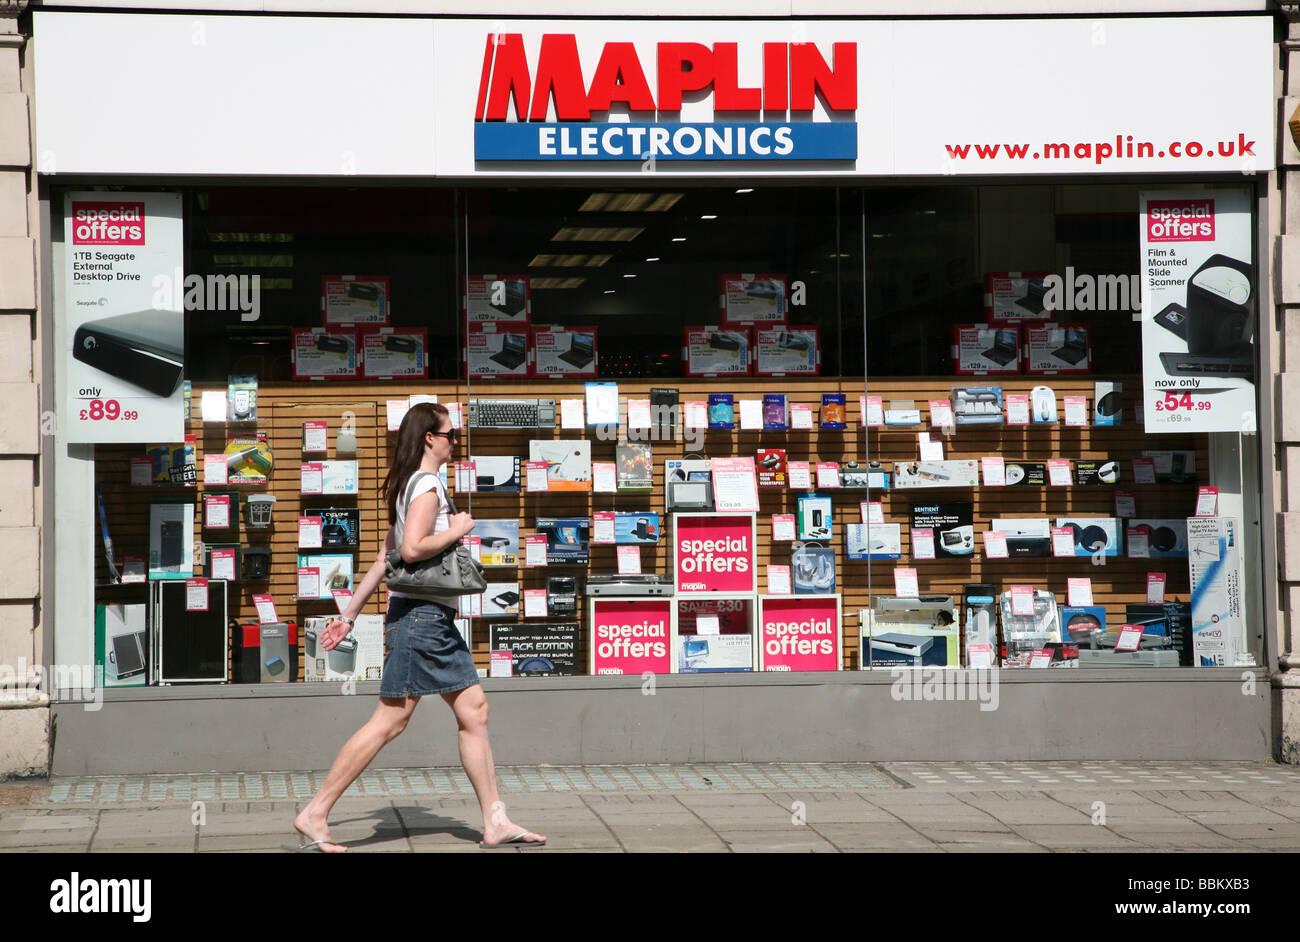 Branch of Maplin electronics, London - Stock Image